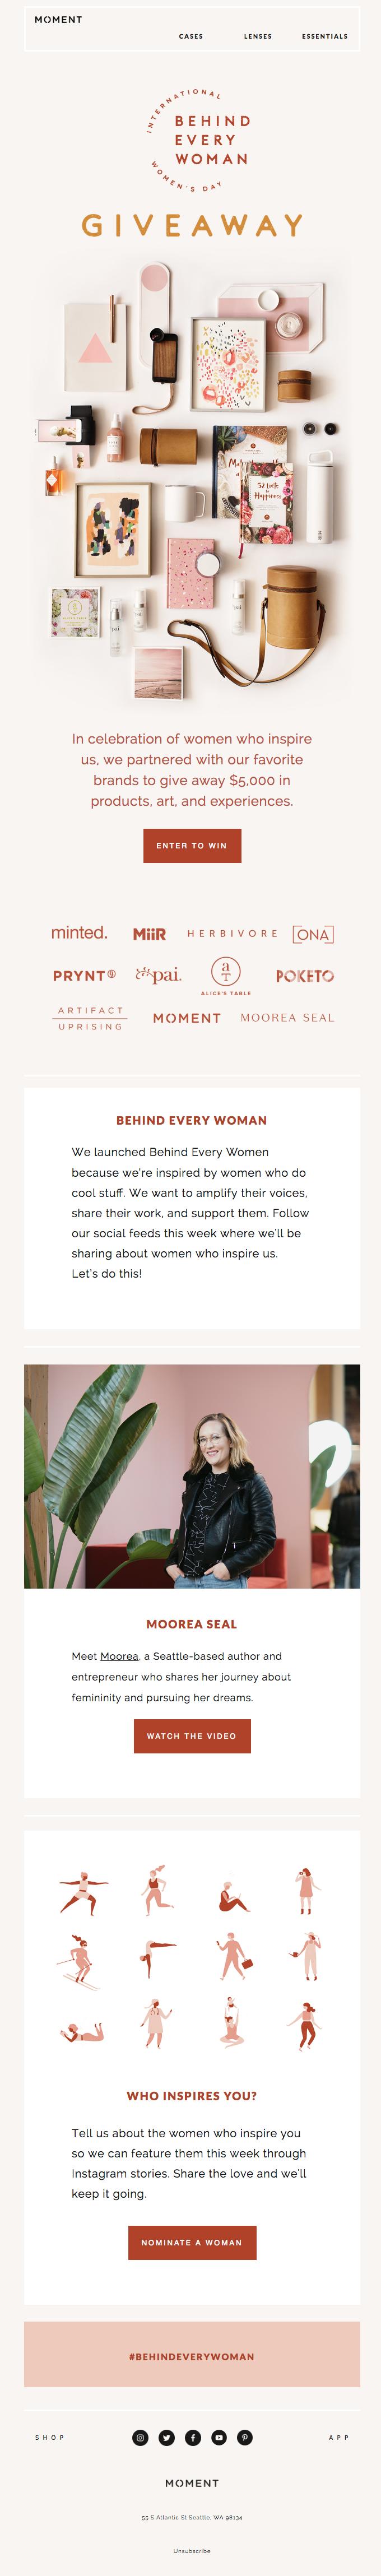 $5k in Prizes to Celebrate International Women's Day